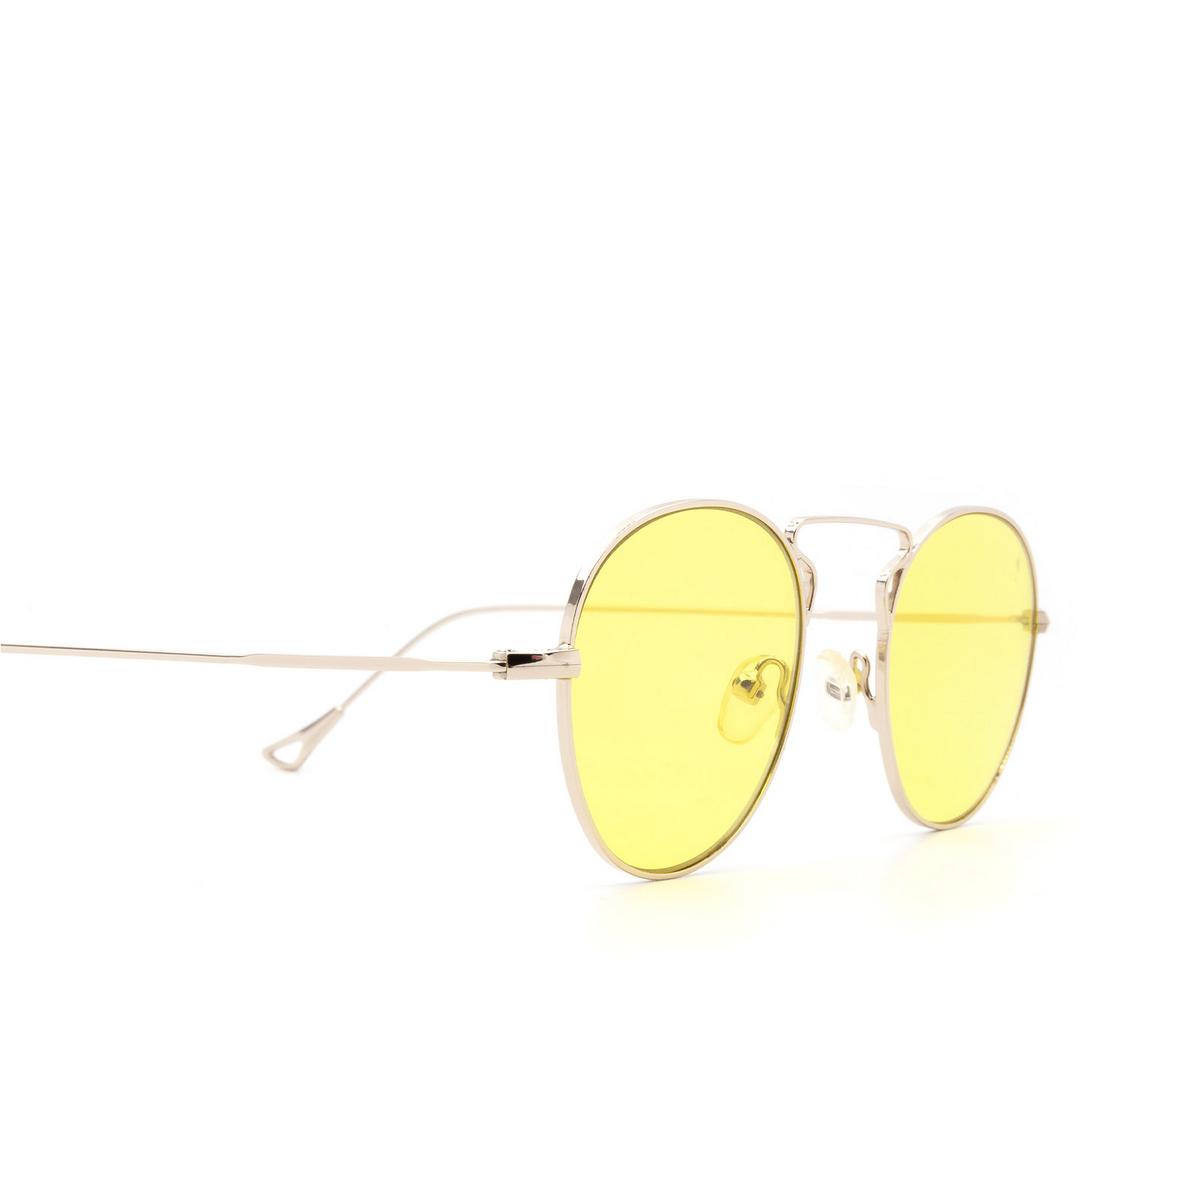 eyepetizer-halles-c-2-4 (2)